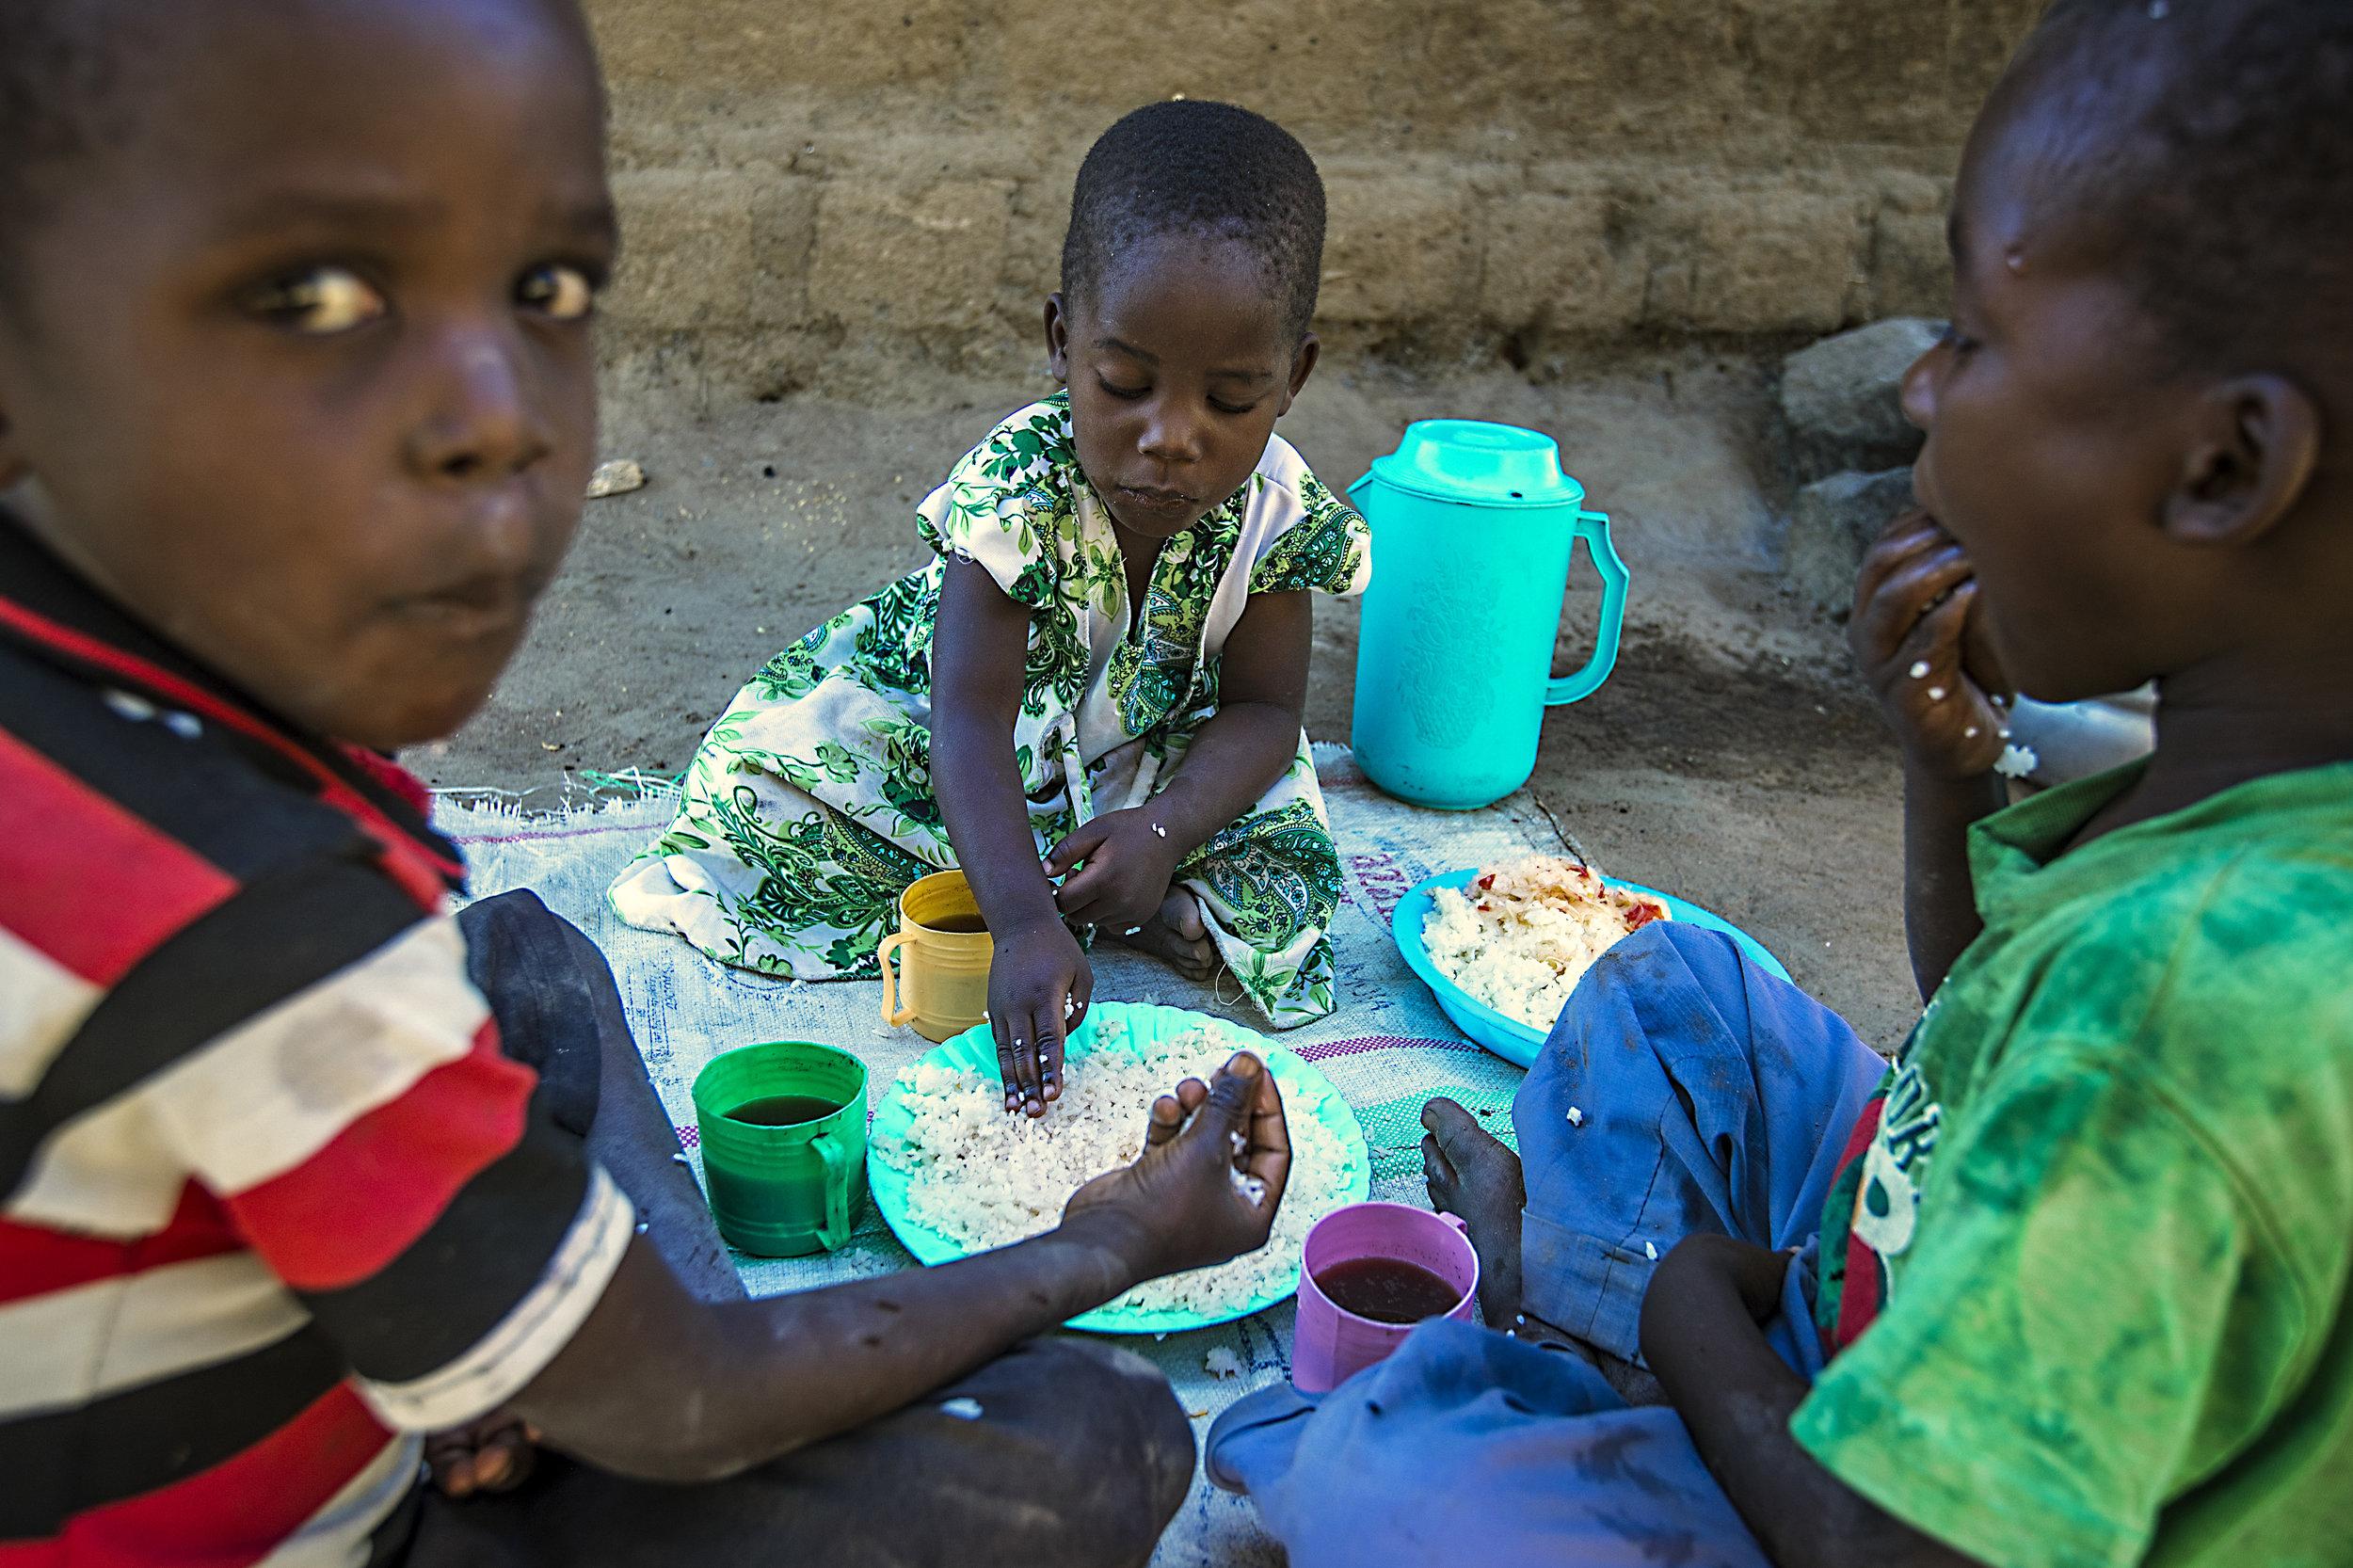 Simon+Needham+Photography+Tanzania+17.jpg